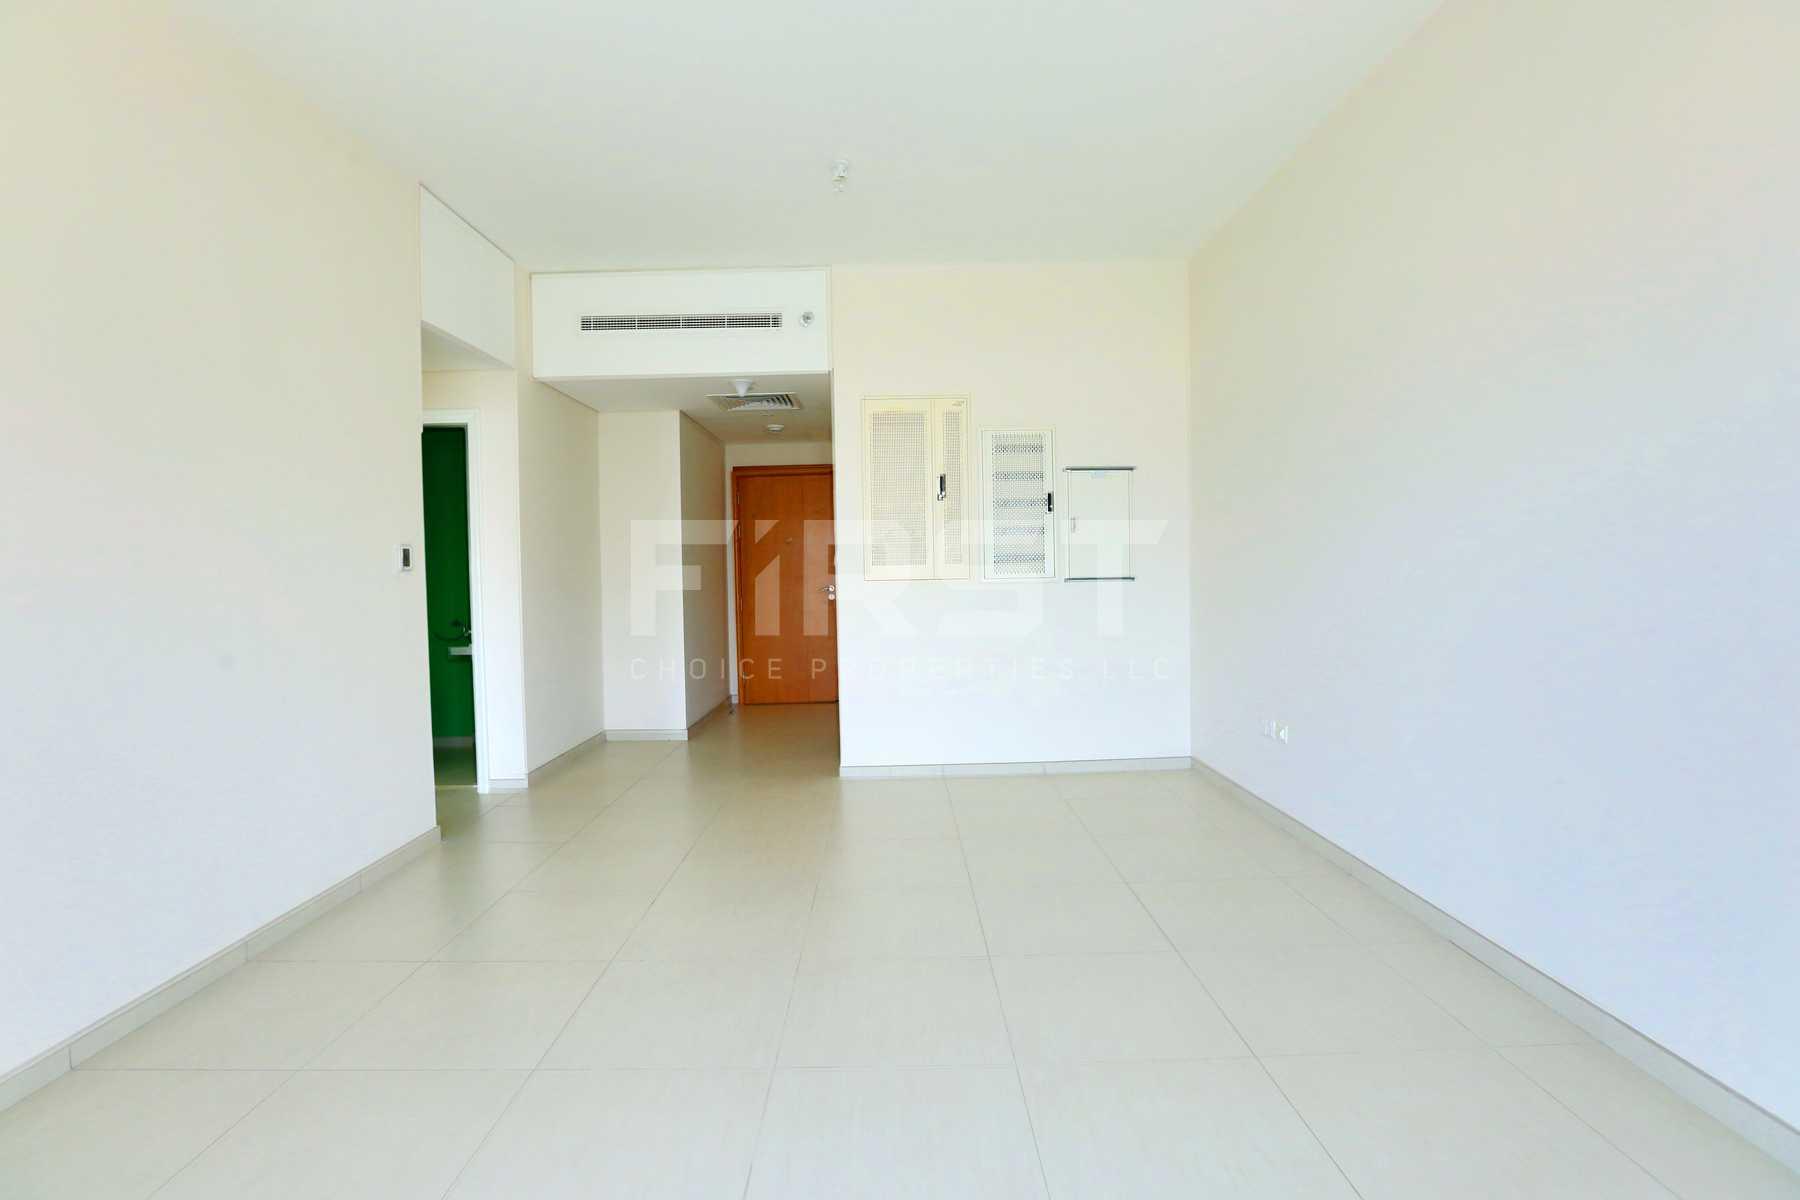 Internal Photo of 1 Bedroom Apartment in Amaya Towers Shams Abu Dhabi Al Reem Island Abu Dhabi UAE (11).jpg